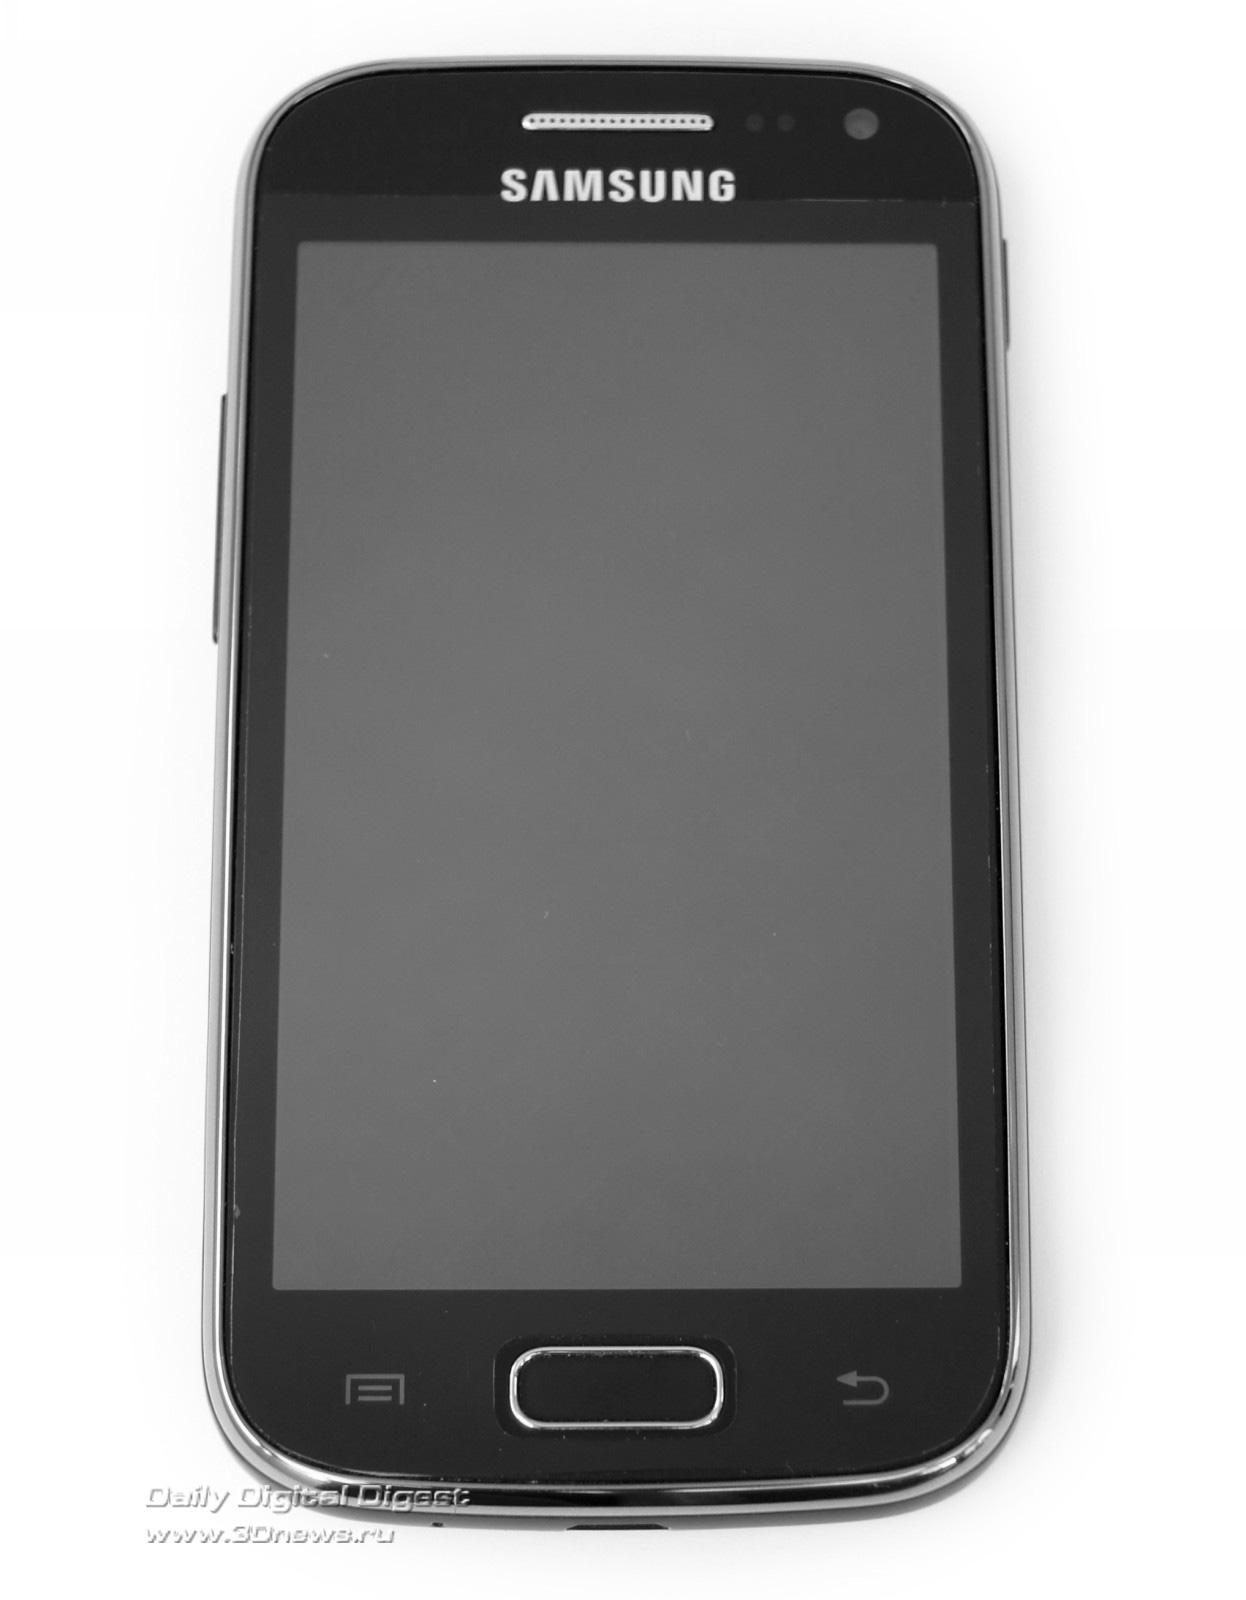 Samsung s5830 galaxy ace 171 чехлы к samsung calaxy ace plus